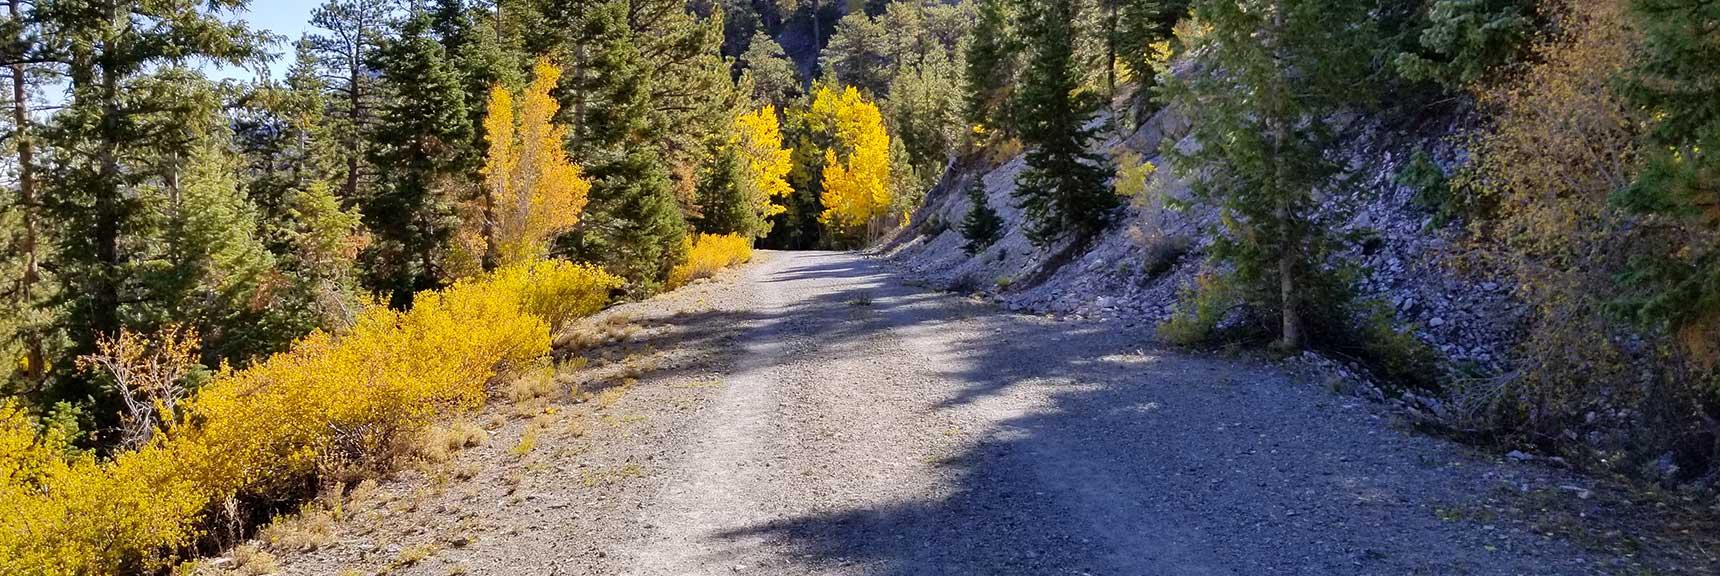 The Fire Road Descending the Last 3 Miles to the Lower Bristlecone Pine Trailhead in Mt. Charleston Wilderness, Nevada